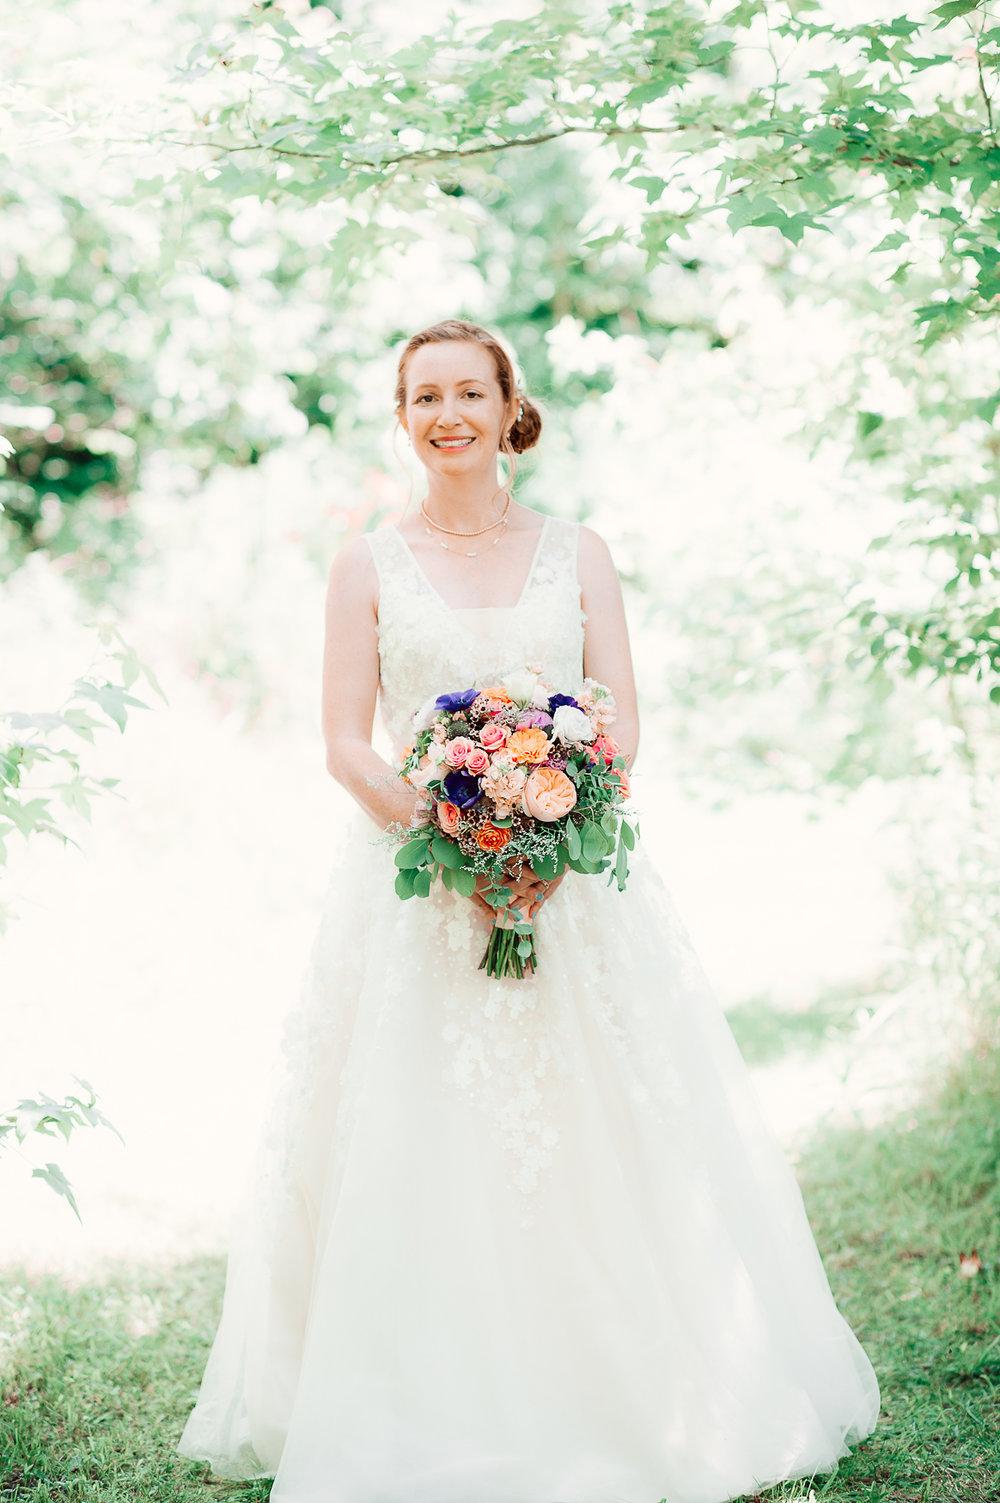 virginiawedding_theGlasgowFarm_rusticwedding_fredericksburg_youseephotography_CarolineDale (59).jpg